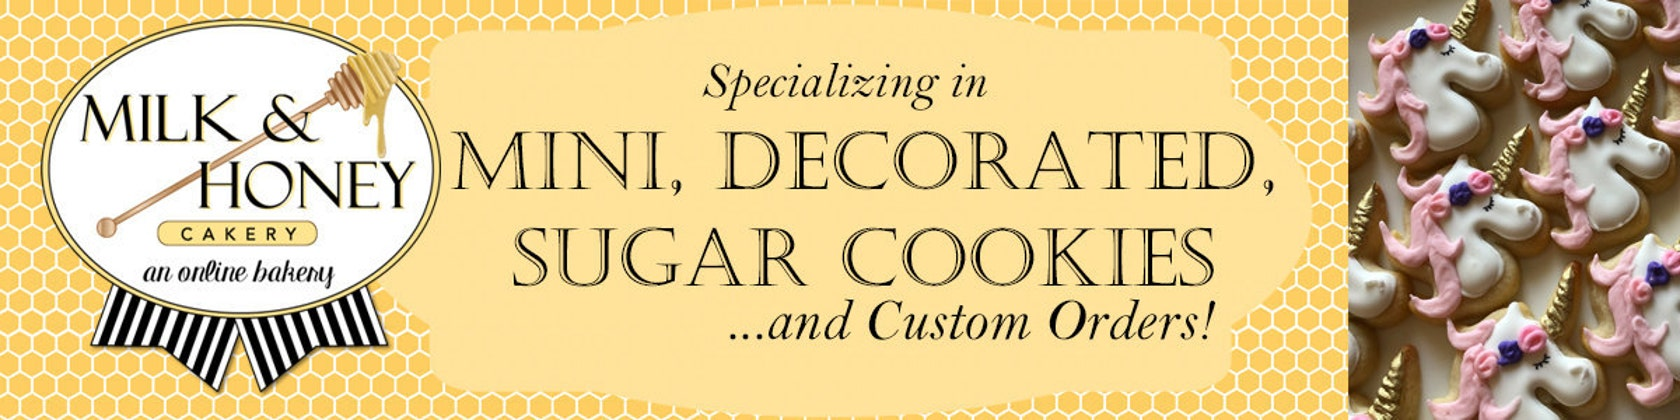 Custom Made Decorated Sugar Cookies and by MilkandHoneyCakery